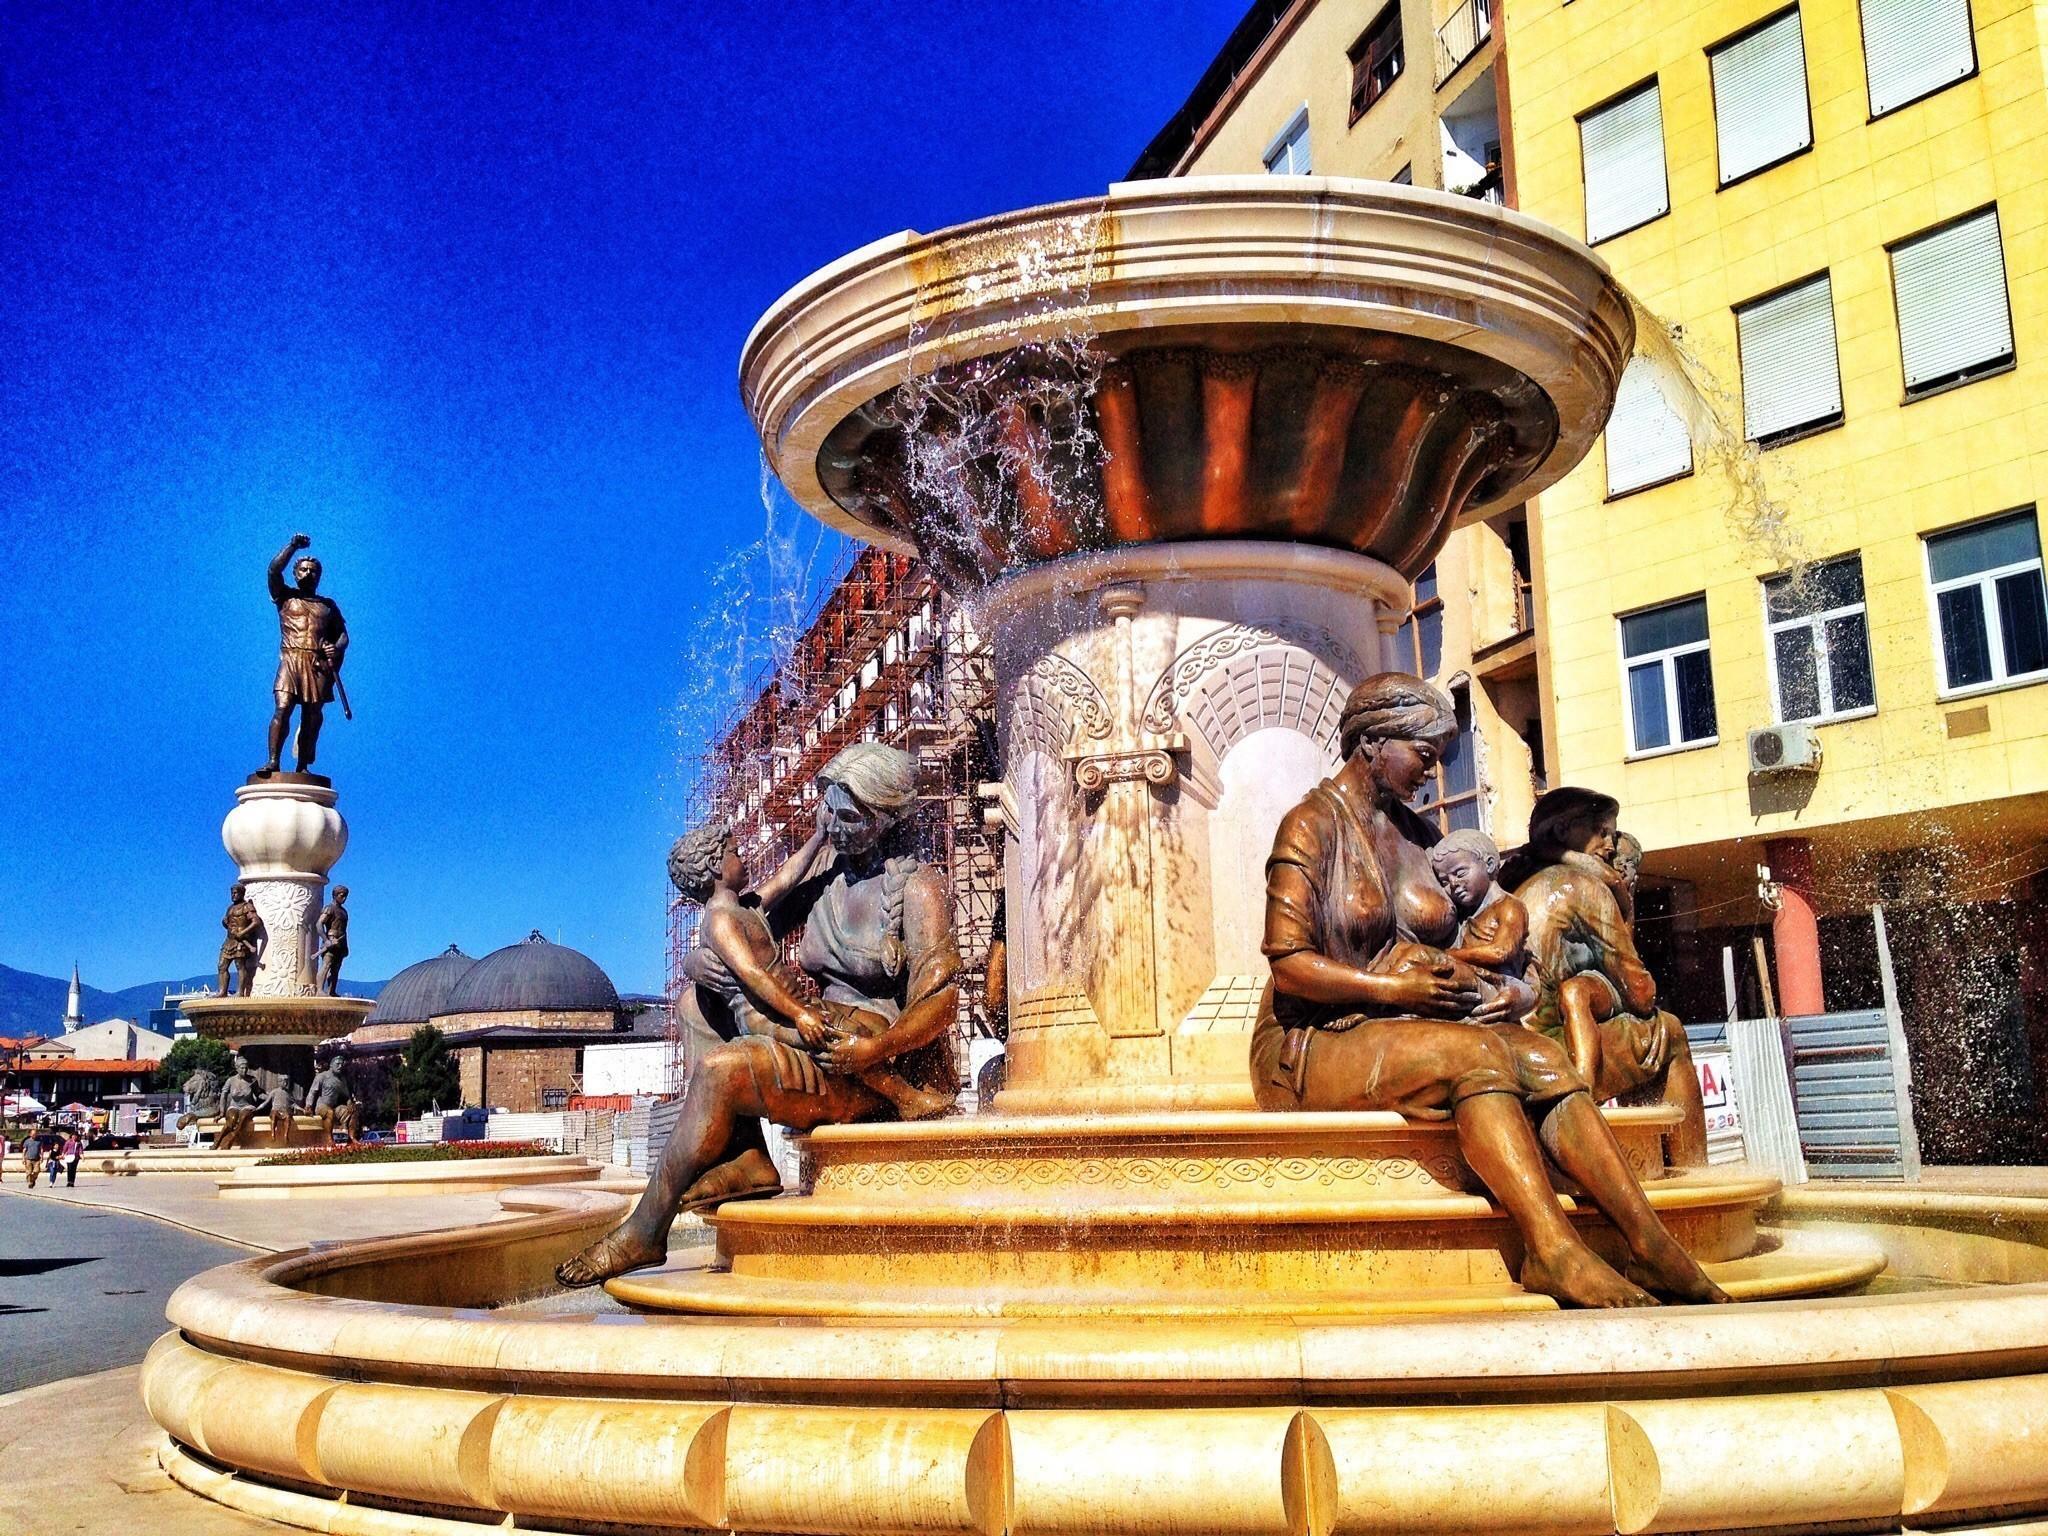 Skopje - the city of statues 48